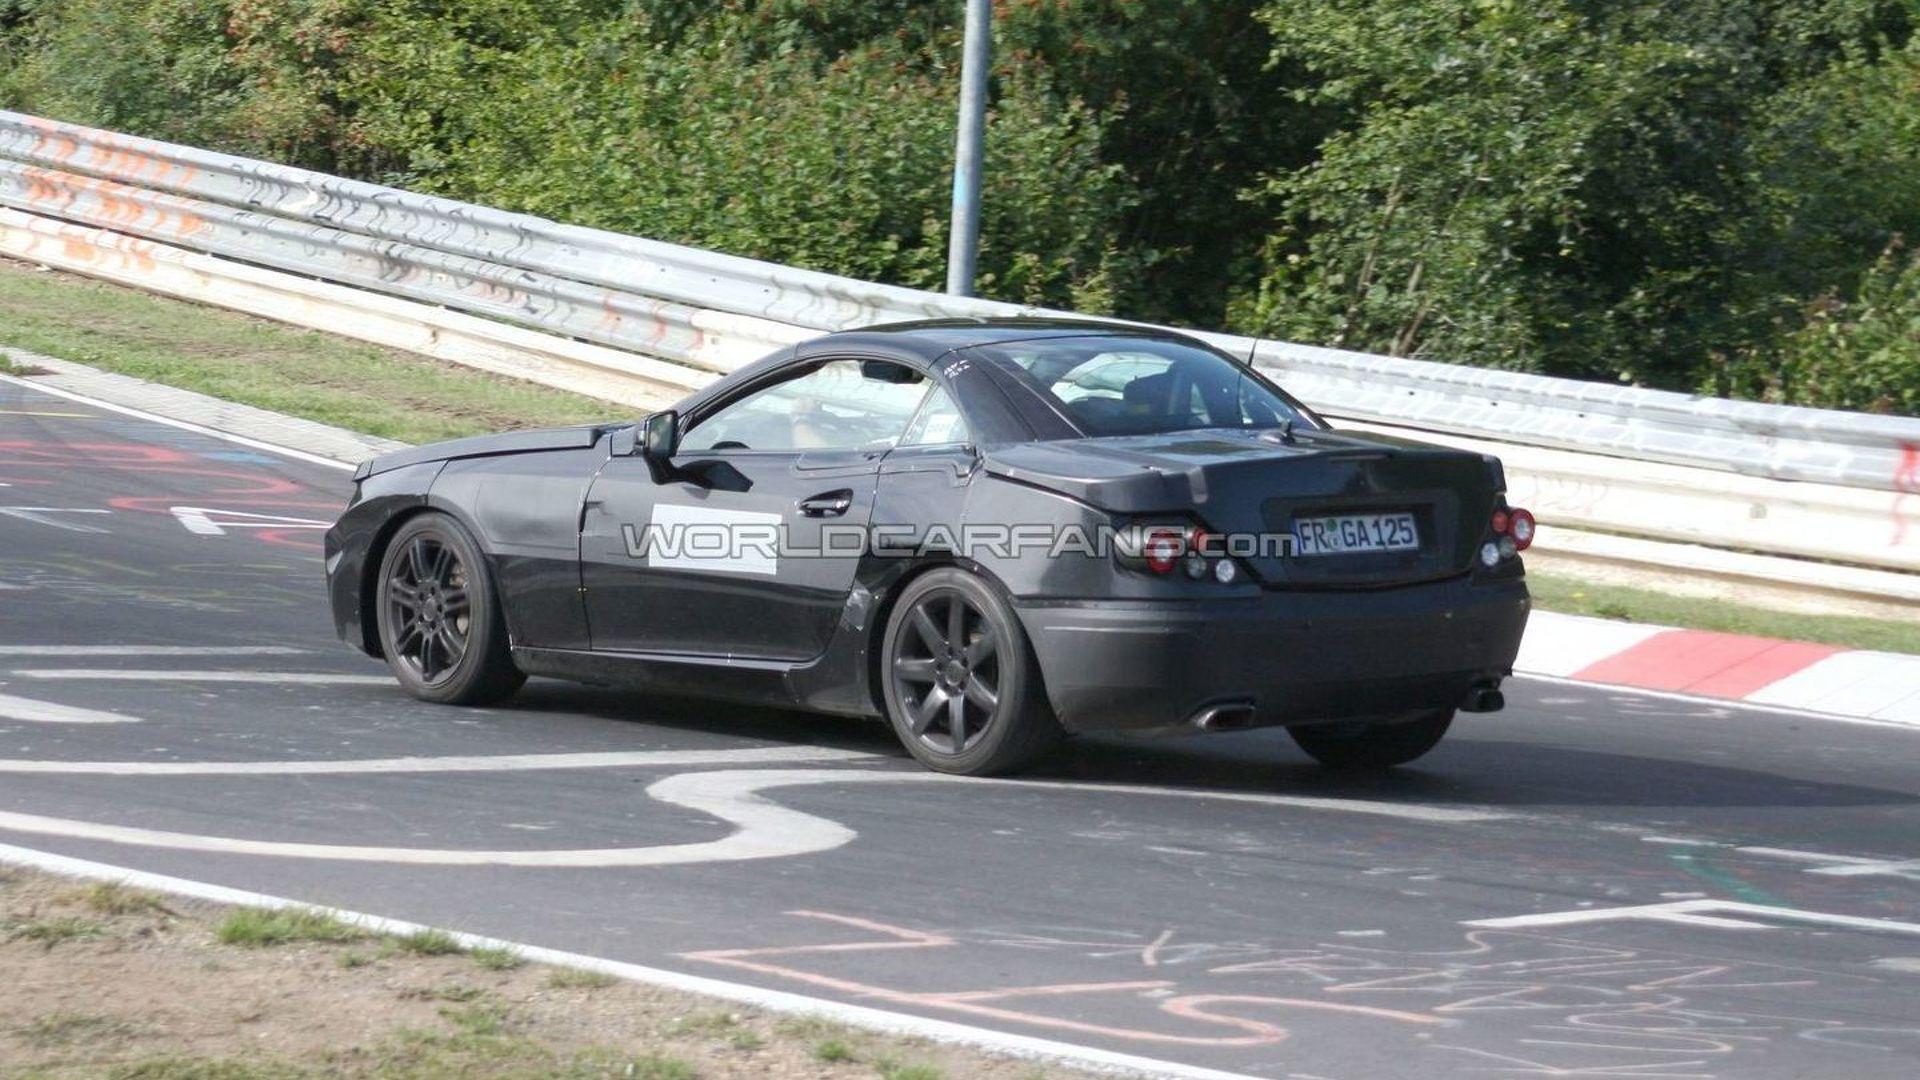 2012 Mercedes SLK spy photos at Nurburgring